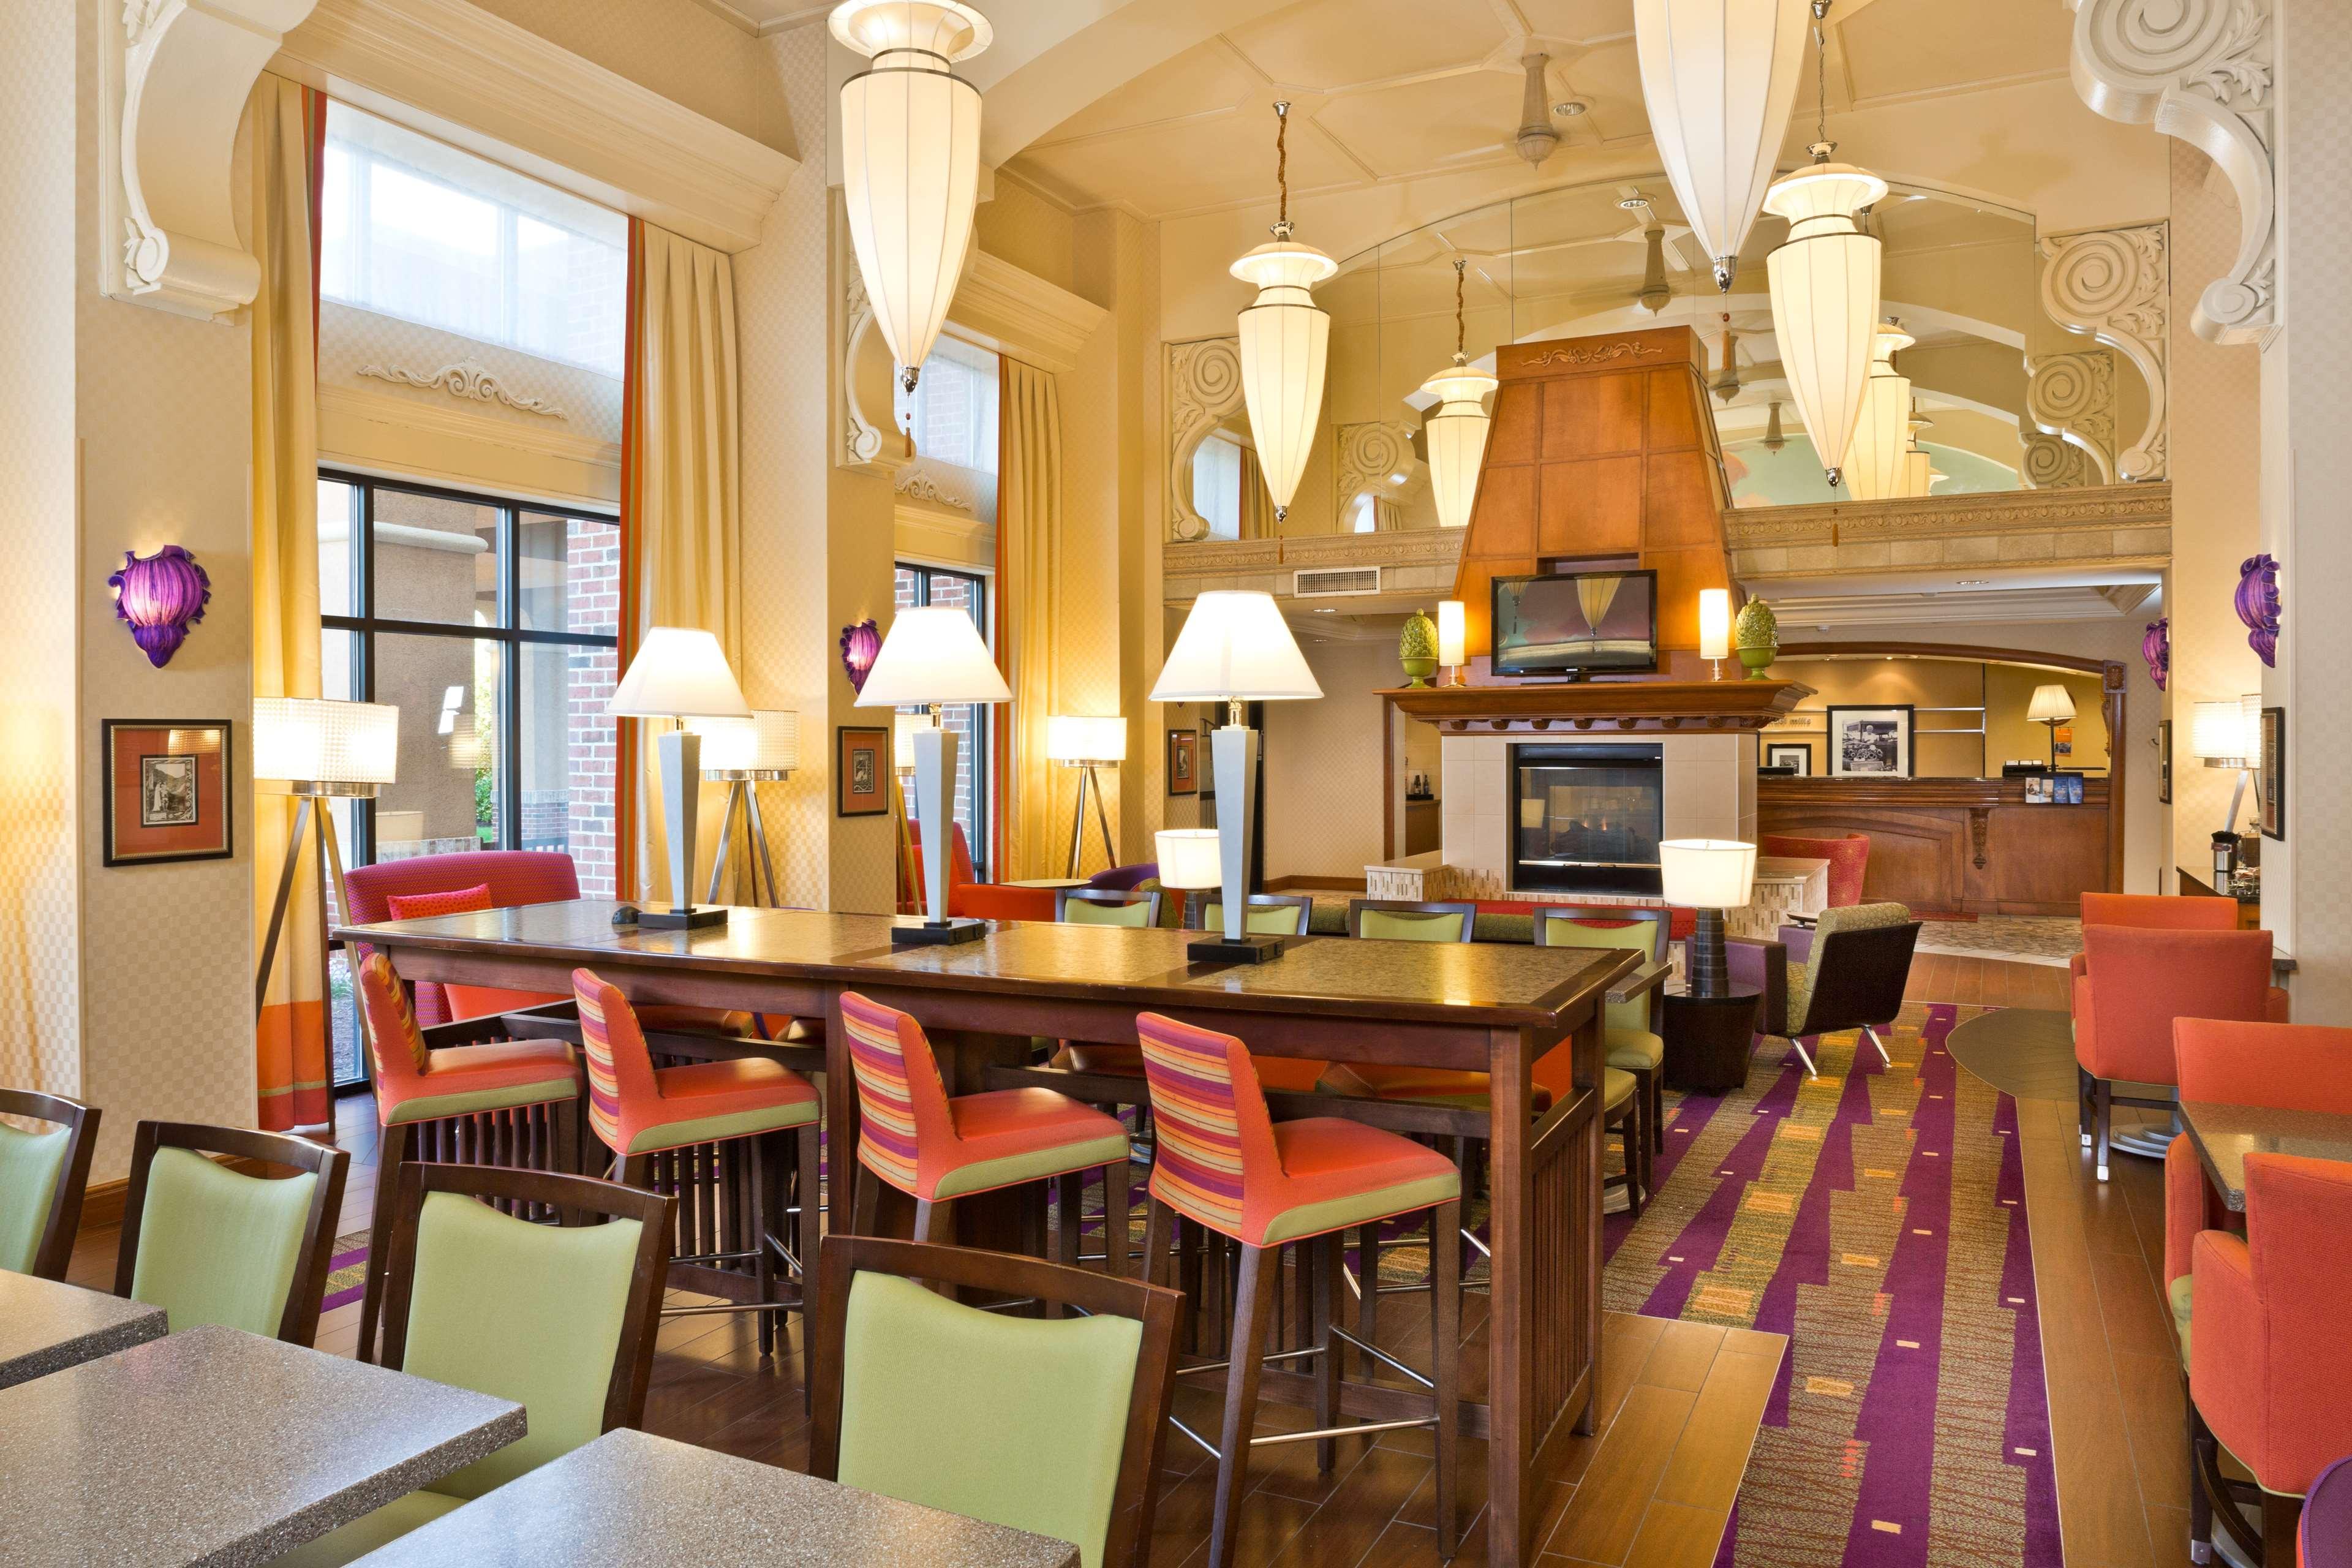 Hampton Inn & Suites Arundel Mills/Baltimore image 3